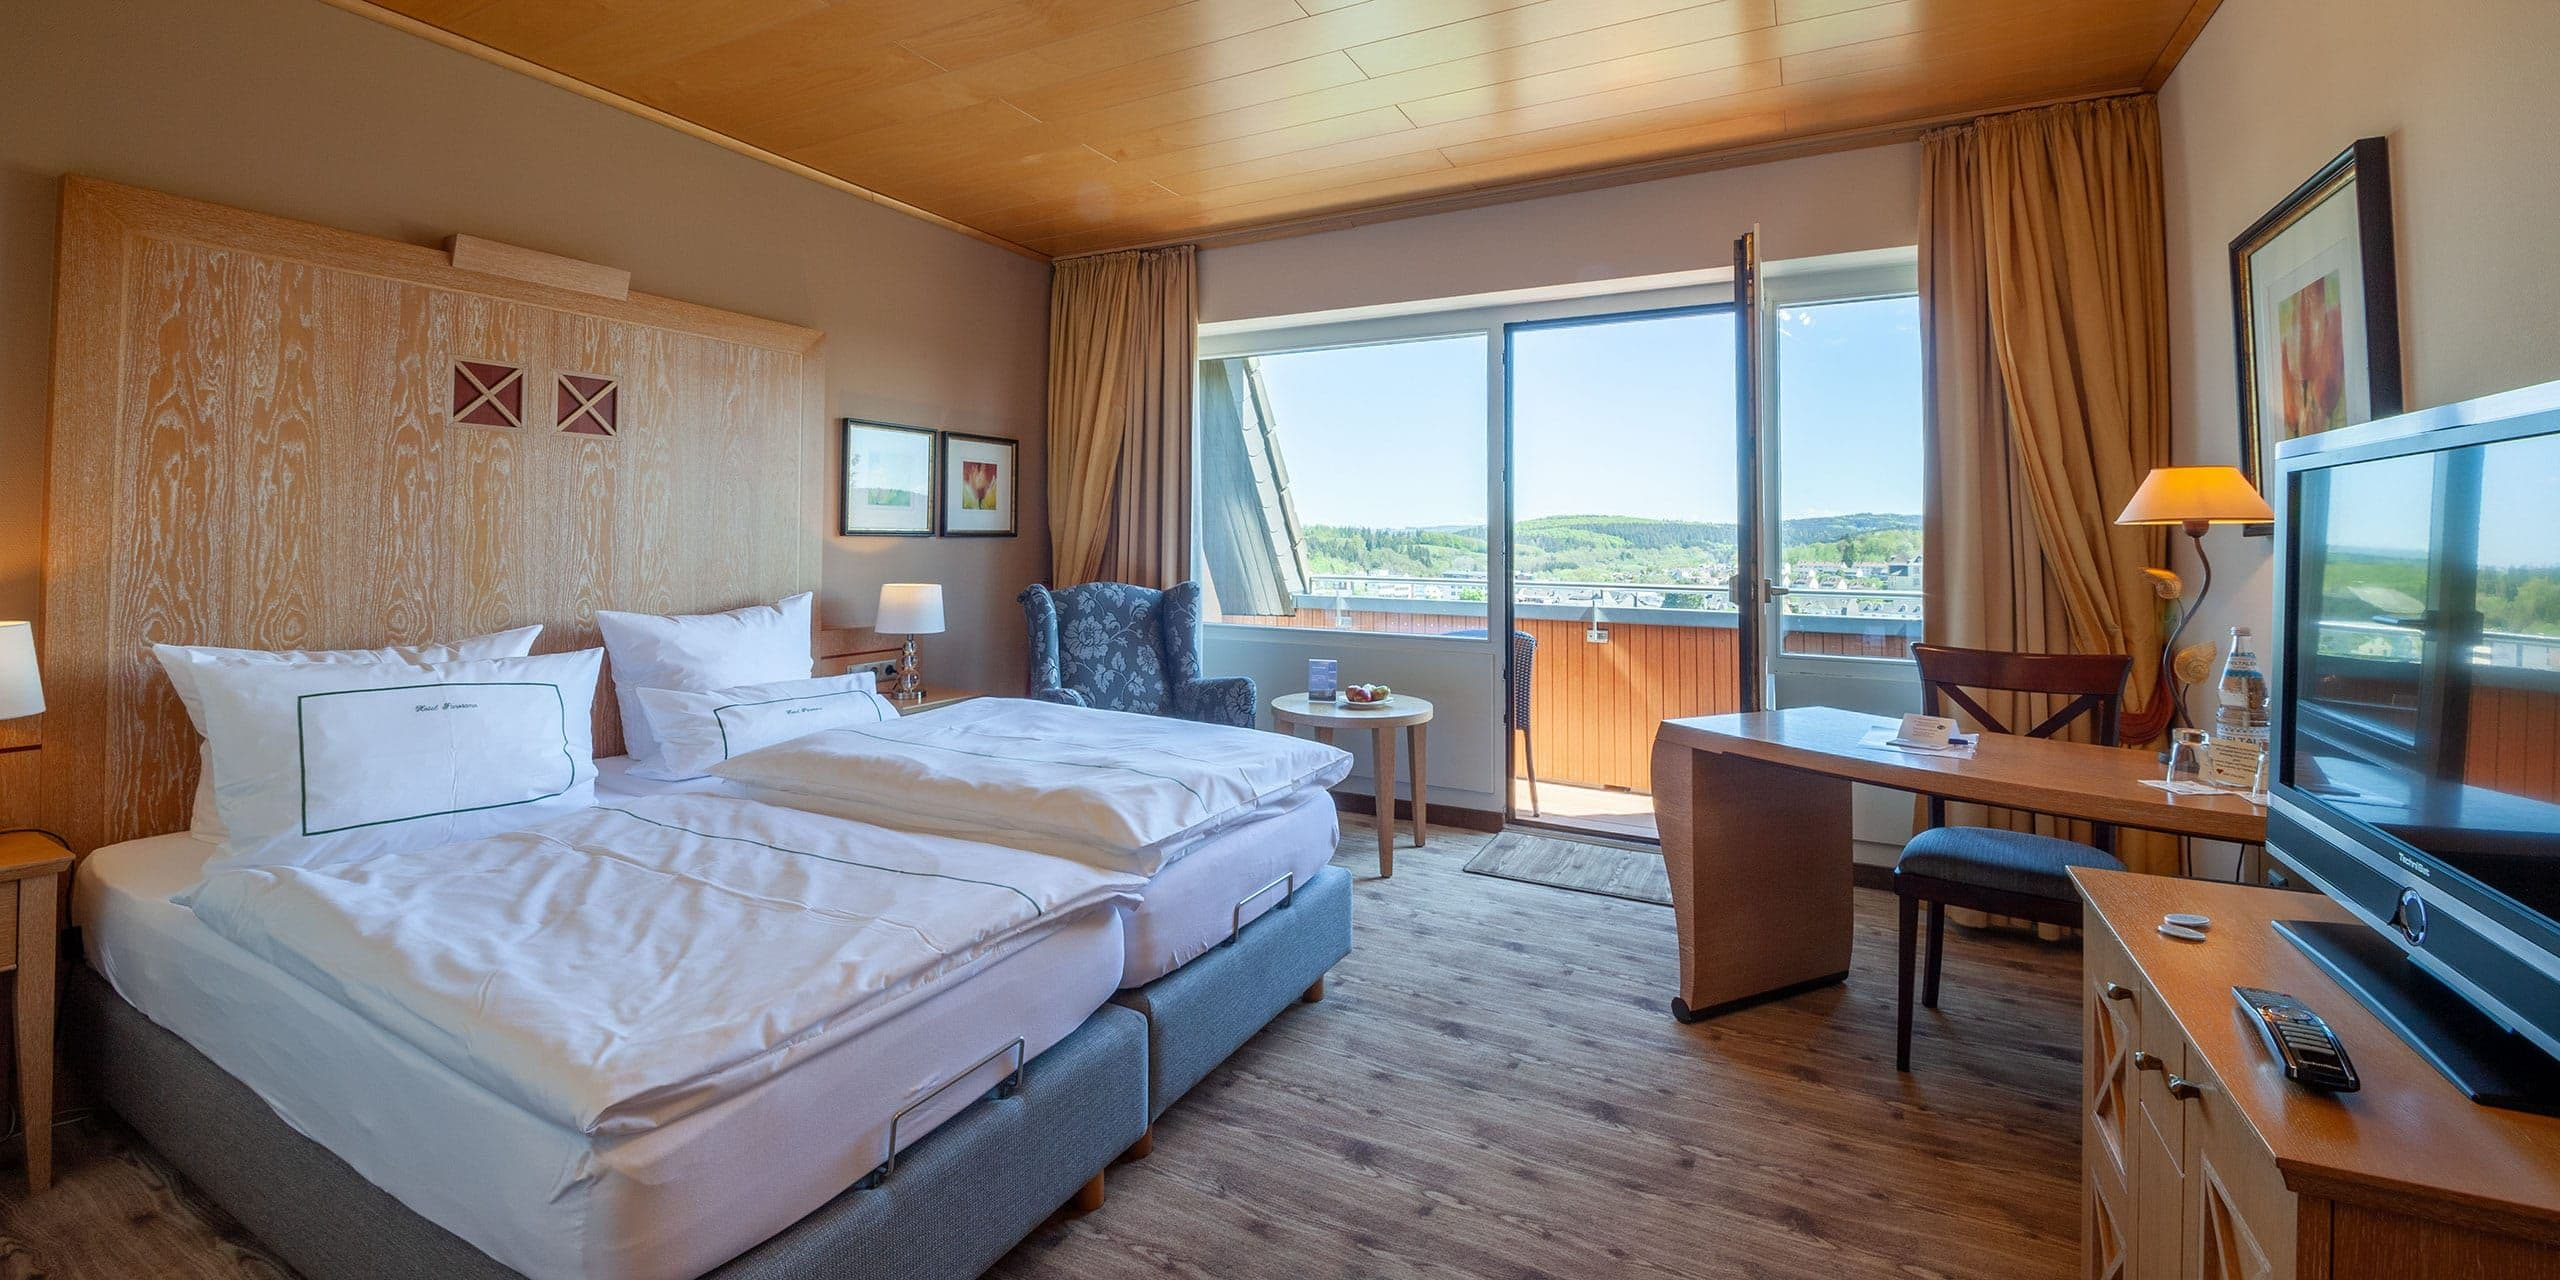 Hotel Zimmer Kategorie Panorama